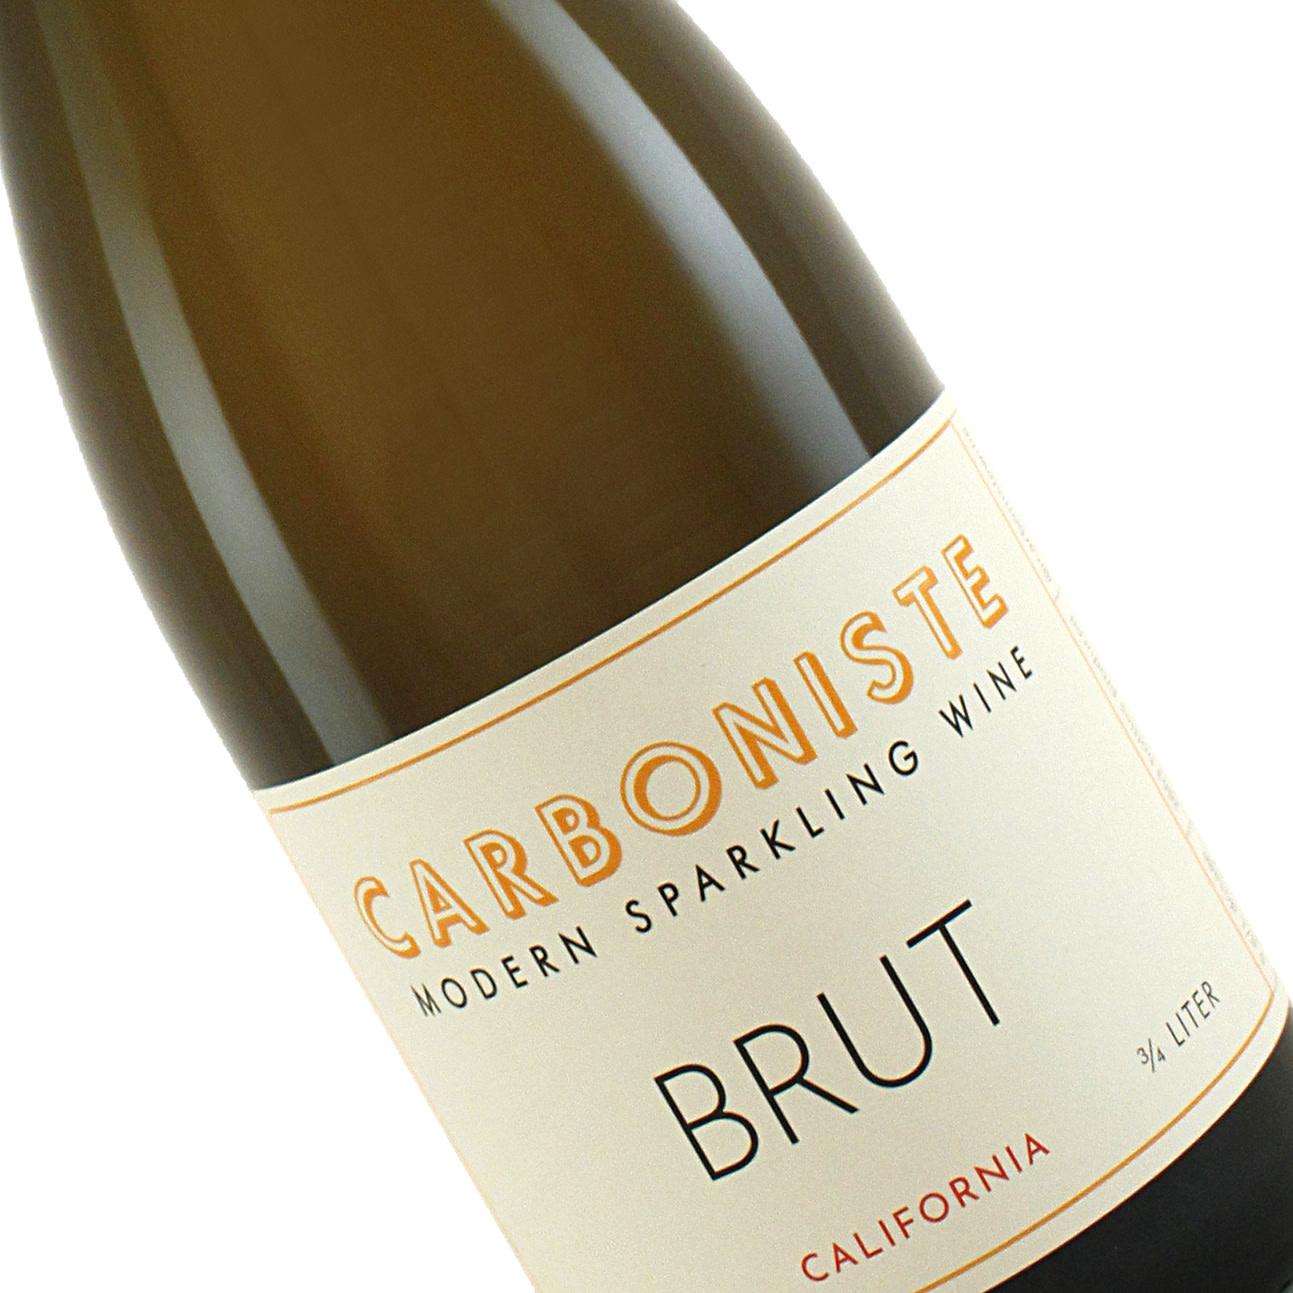 Carboniste 2018 Brut Sparkling Wine, California